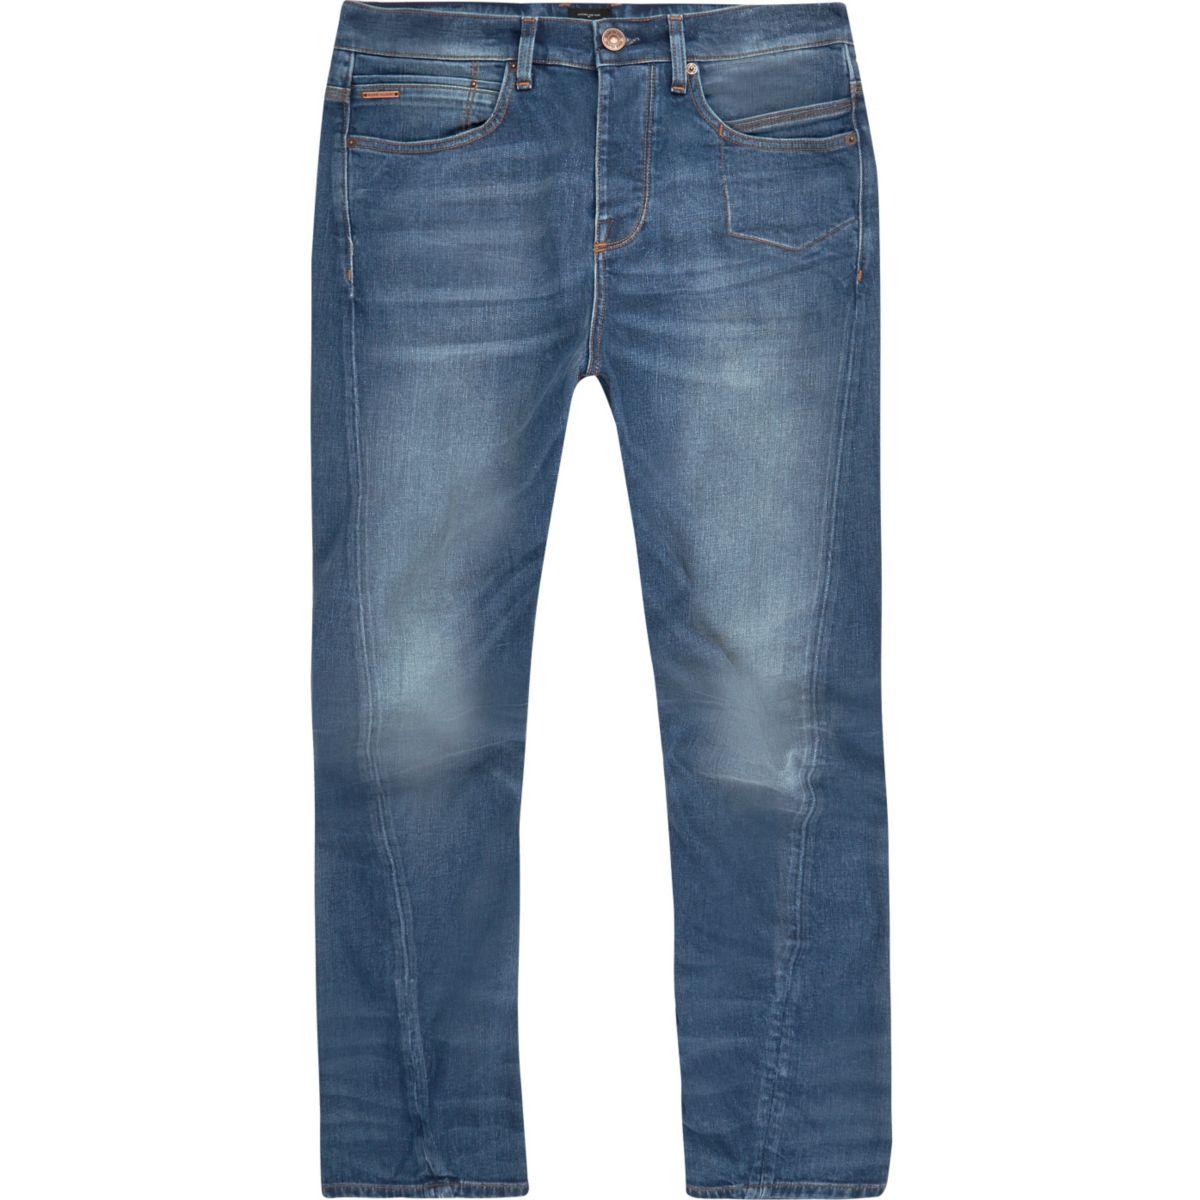 Jean Curtis bleu délavage moyen coupe large